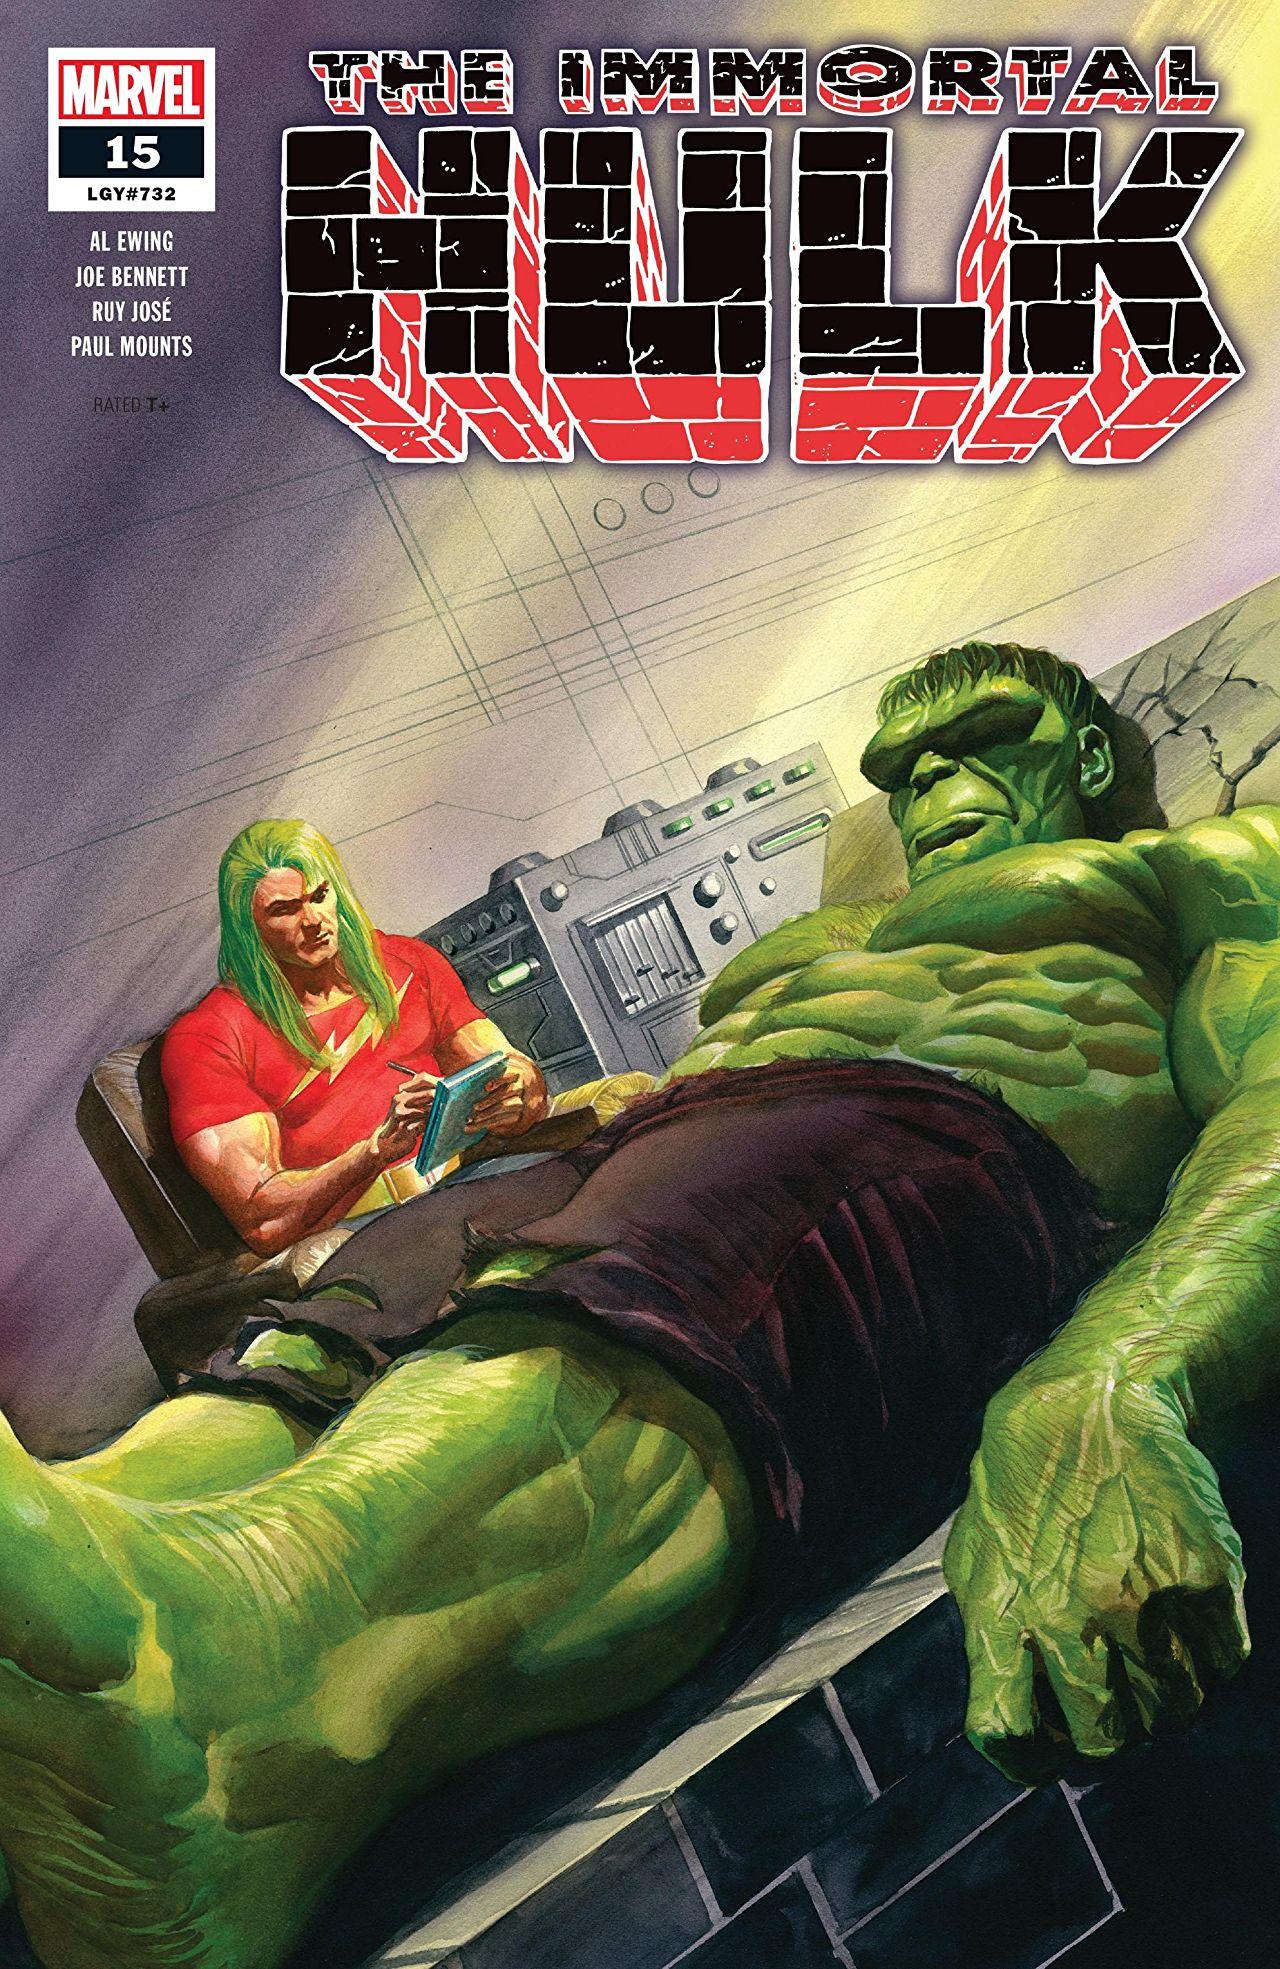 Immortal Hulk Vol 1 15.jpg